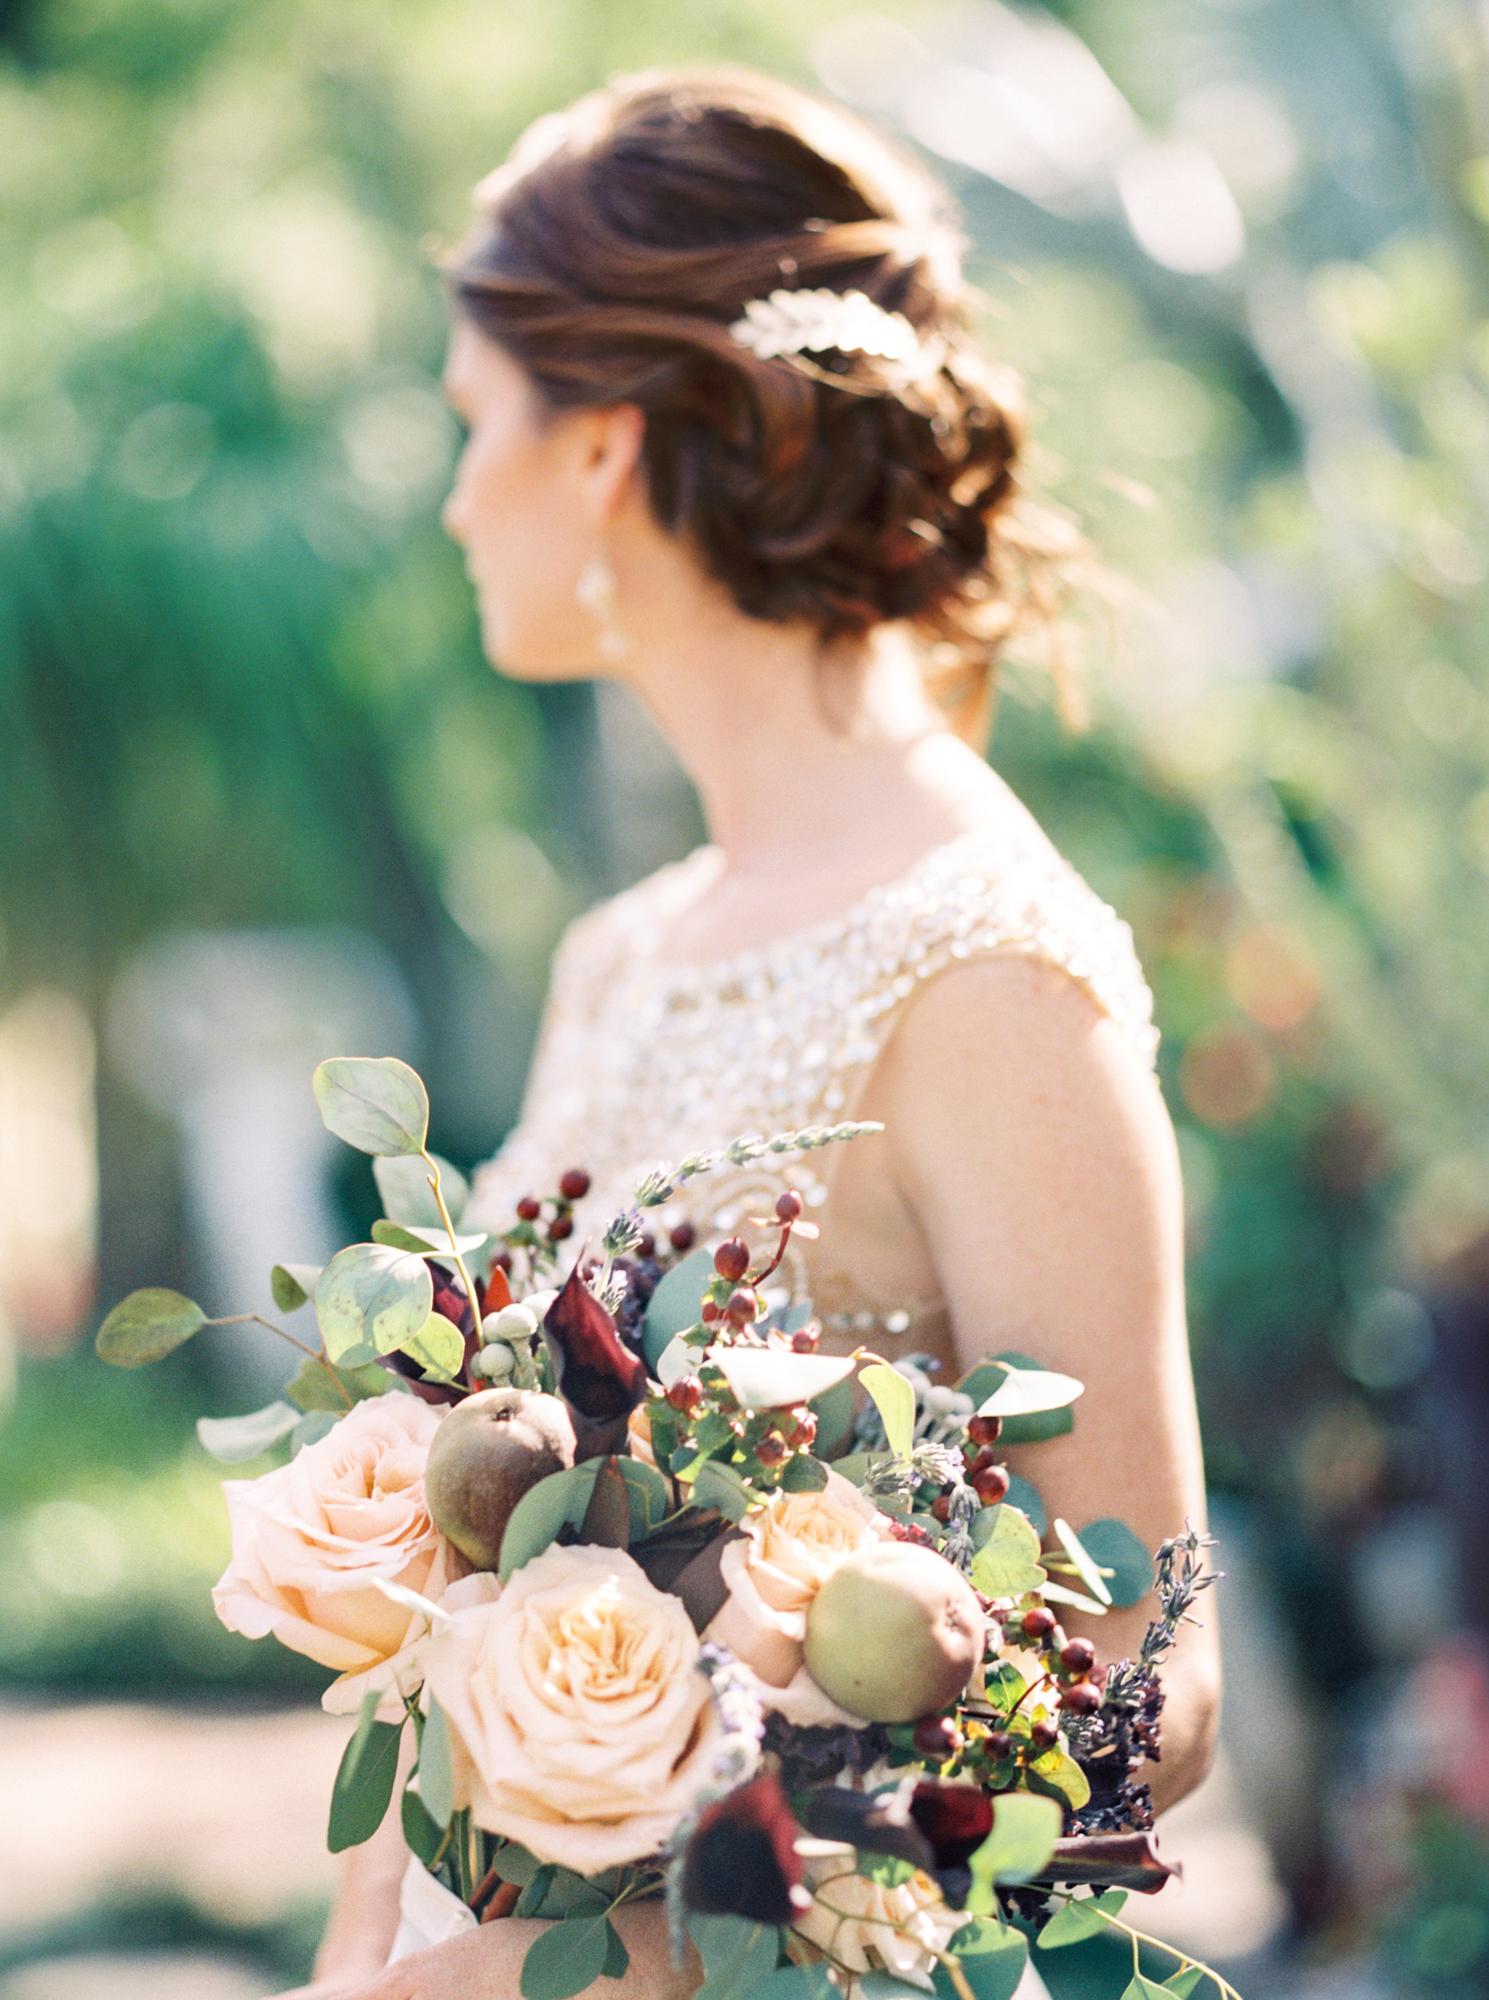 valkaria gardens palm bay FL brides bouquet wedding photos